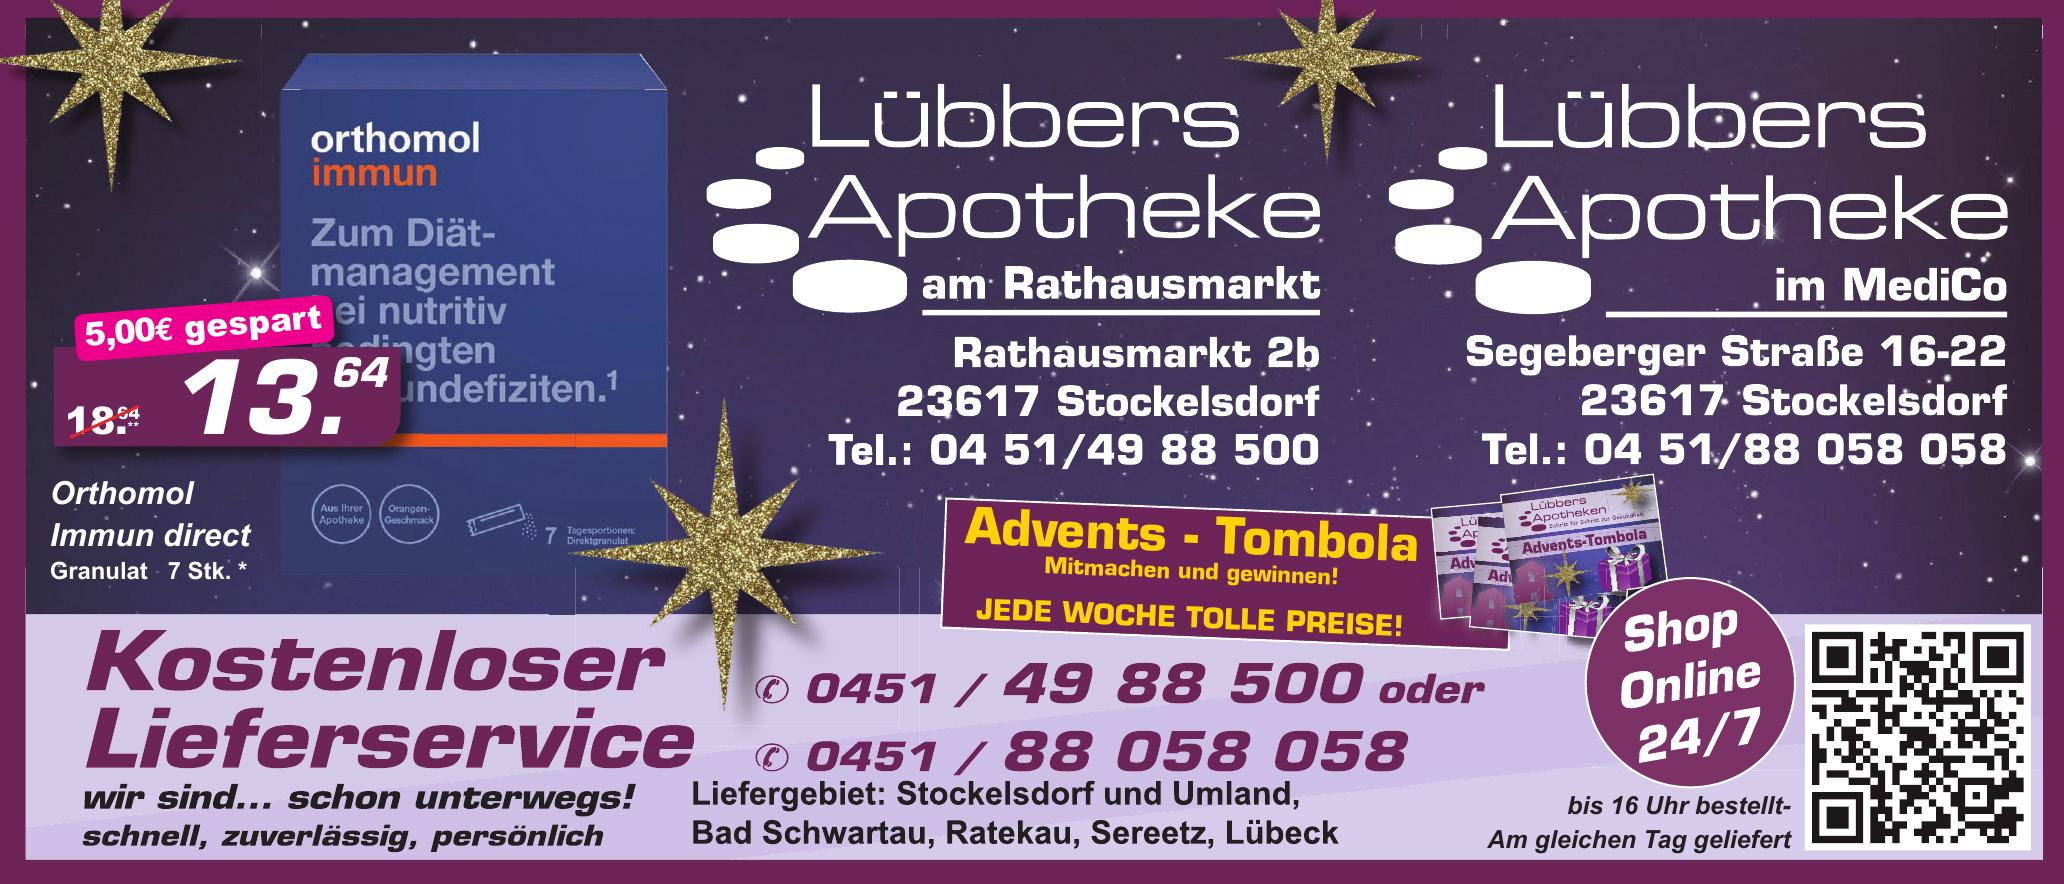 Lübbers Apotheke am Rathausmarkt